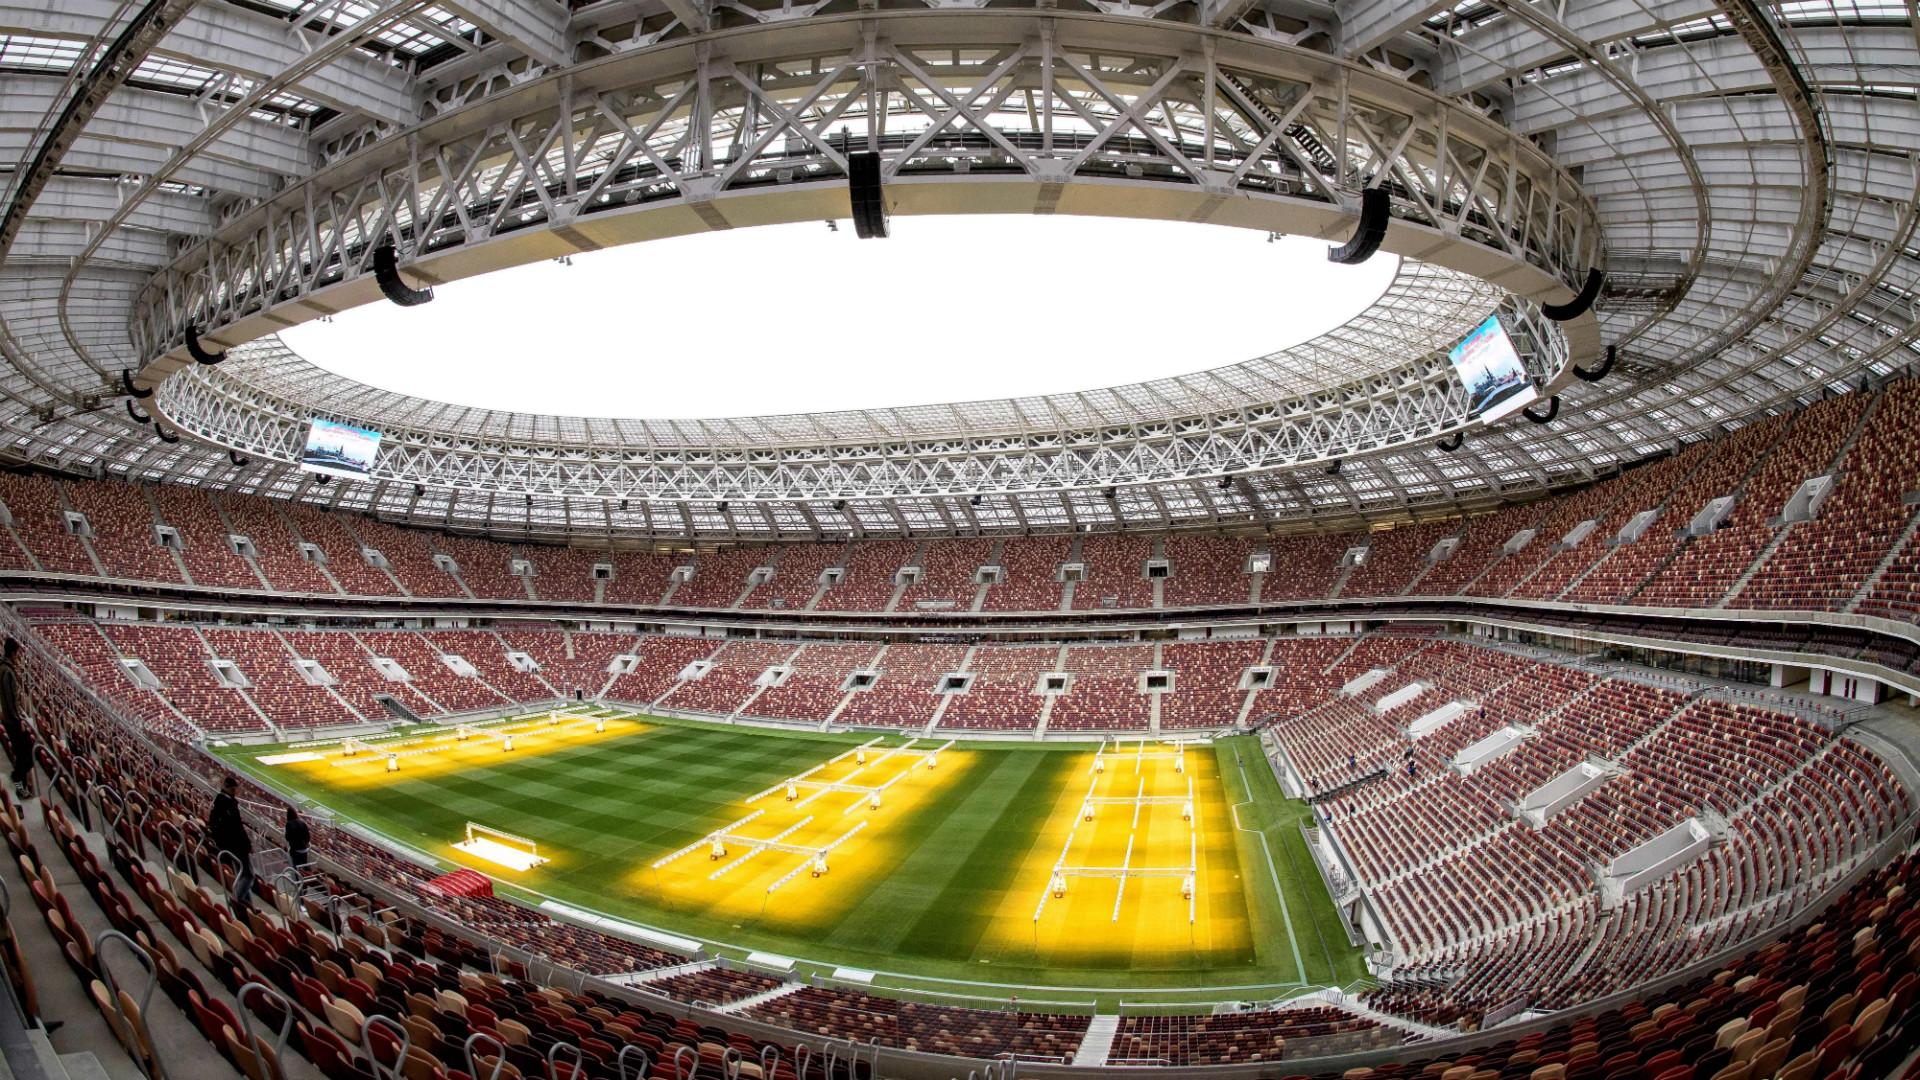 luzhniki-stadium-moscow_3576xst289xy1r0jnplwdnqvn